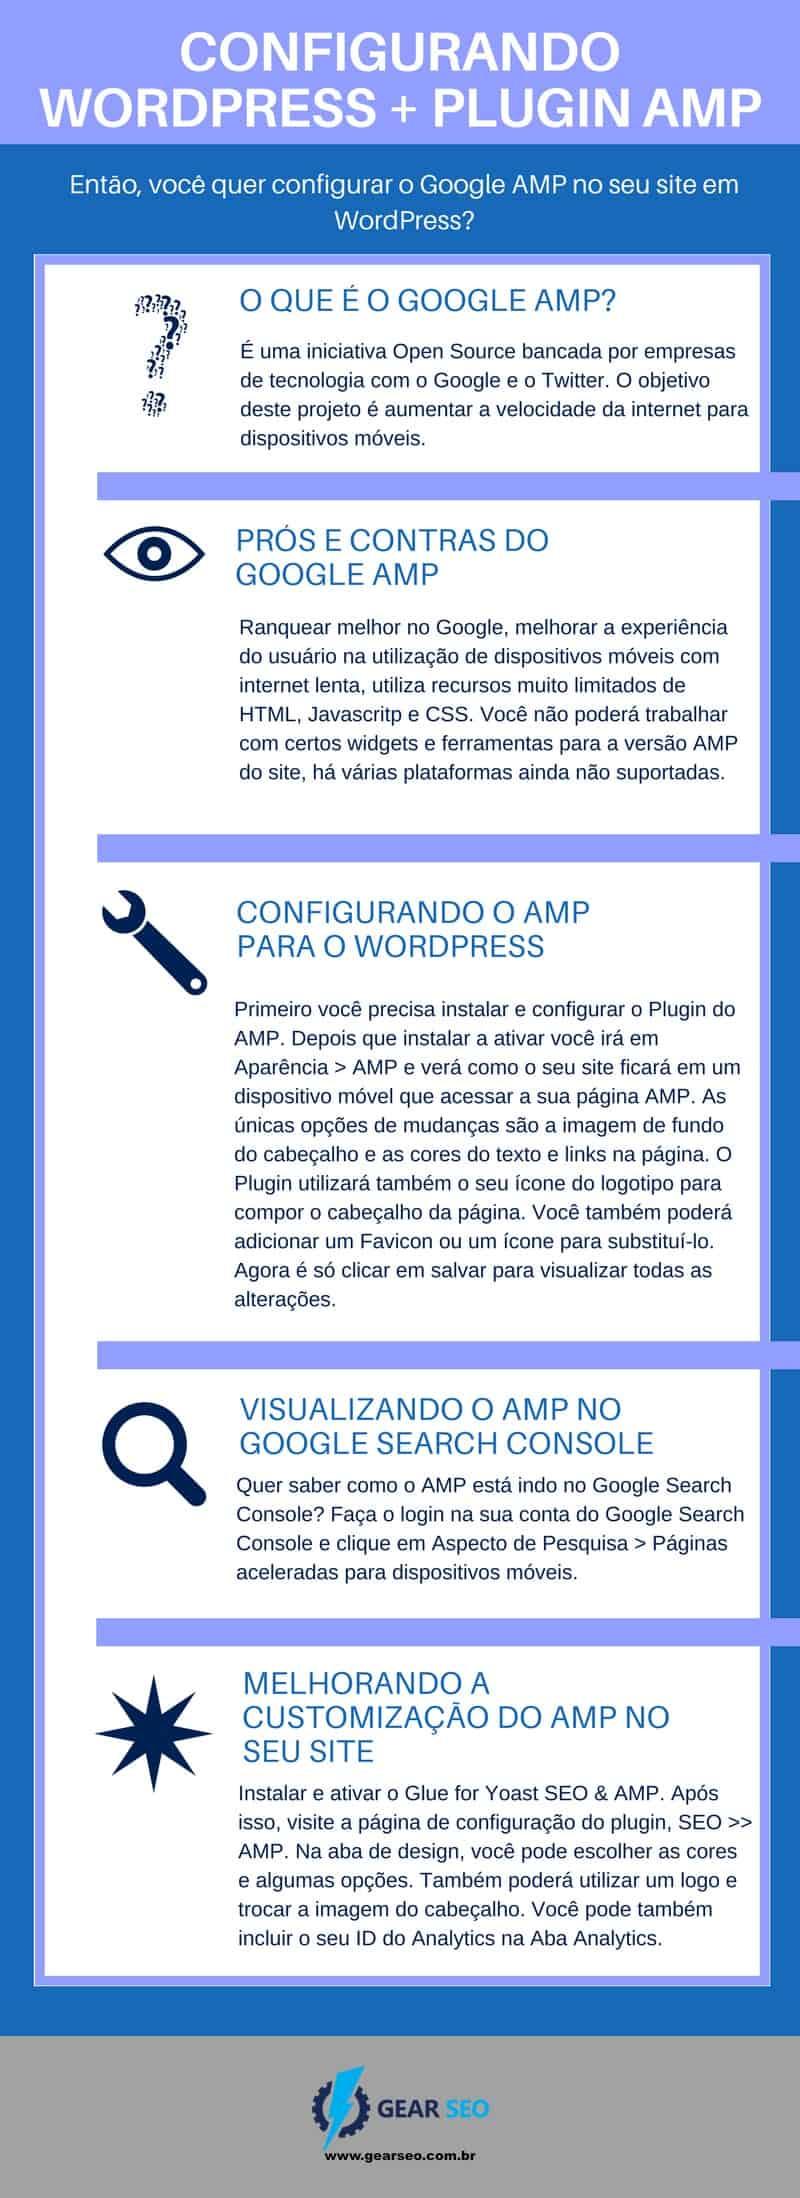 Configurando-Wordpress-AMP